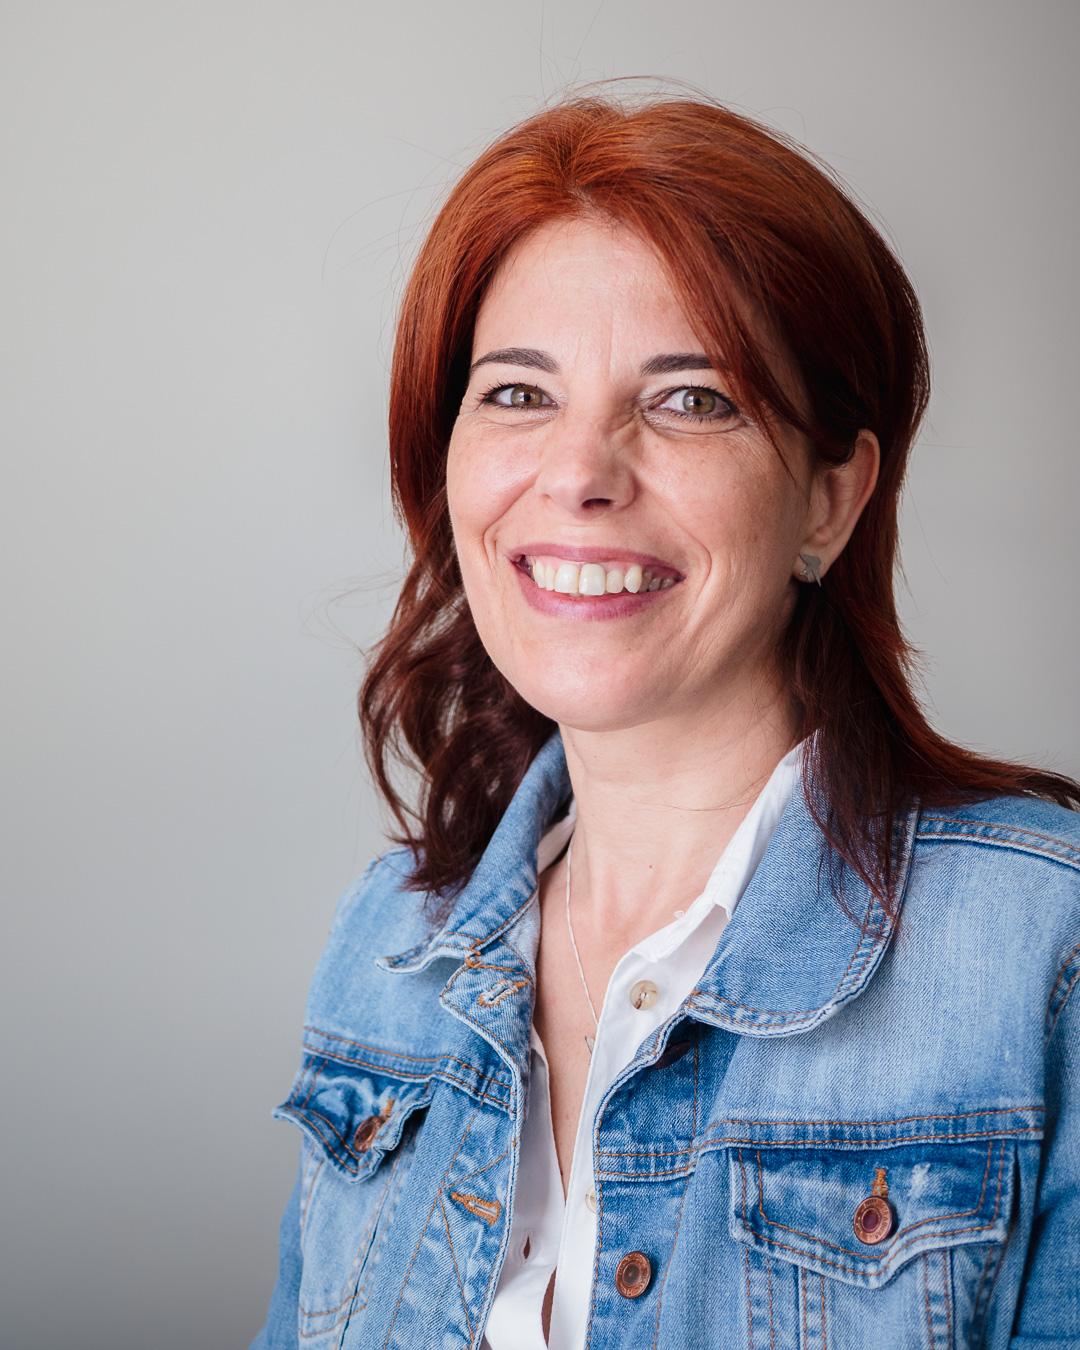 Susana Magalhães